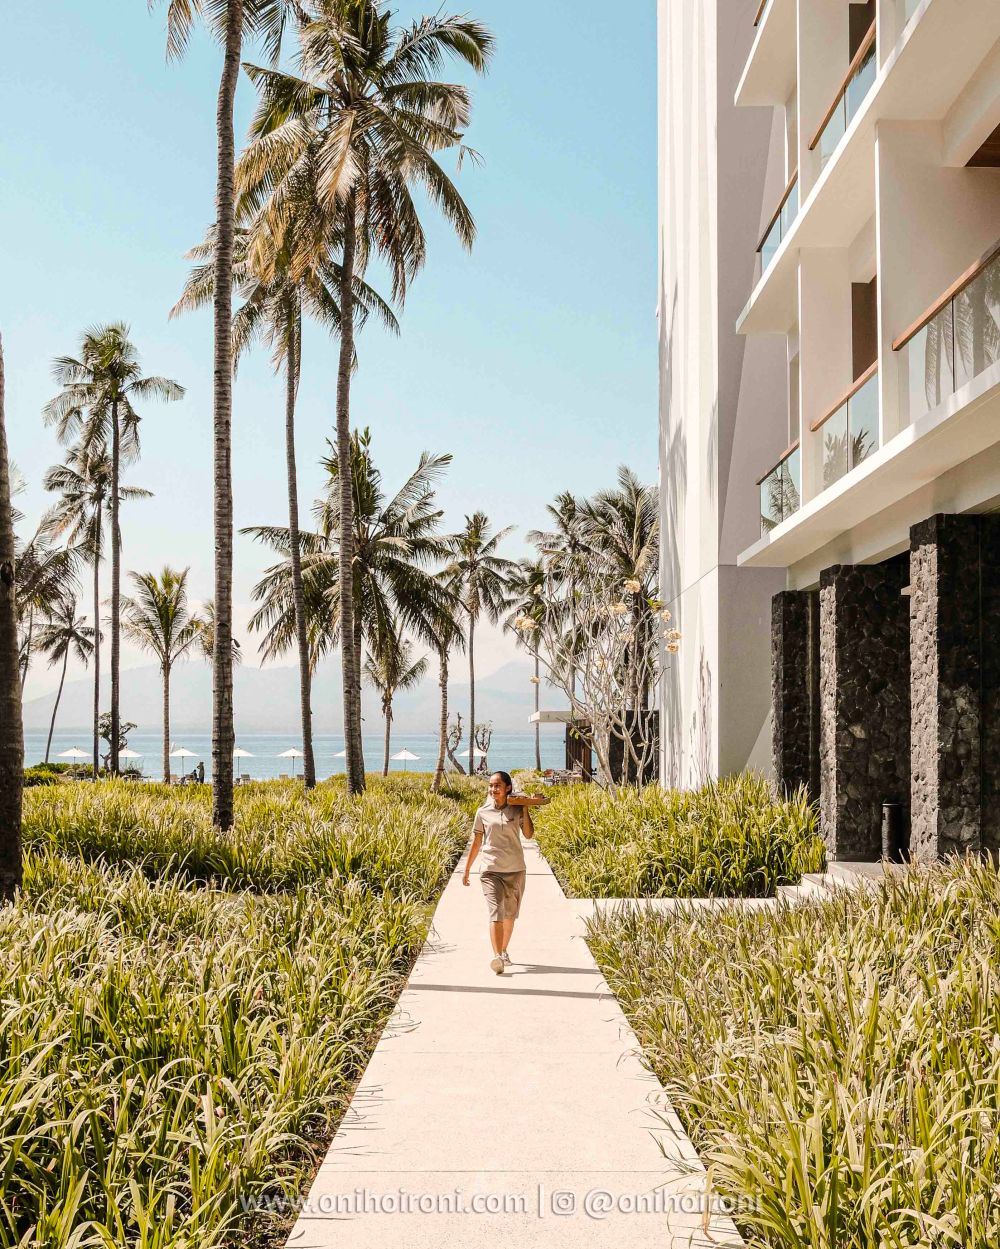 1 Spot instagramable Review Hotel Dialoog Banyuwangi oni hoironi